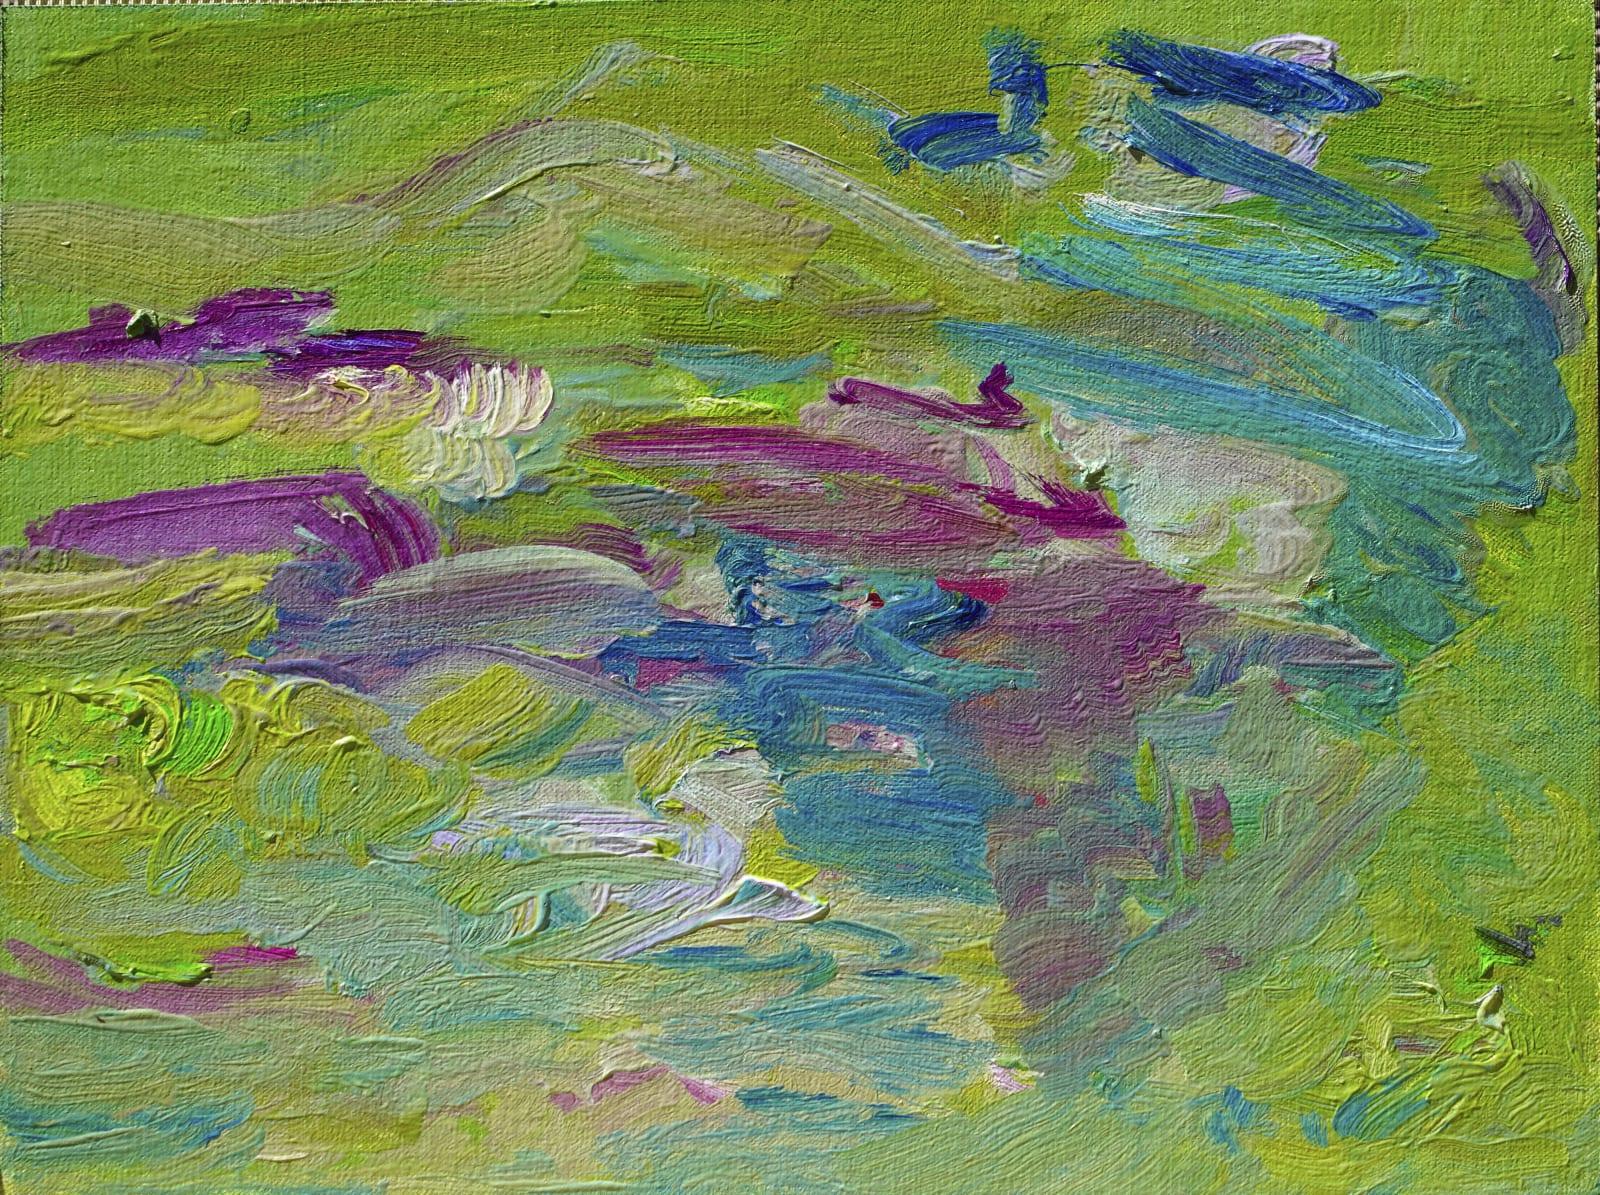 Pamela Davis Kivelson, #83 Chartreuse Transgressions, 2020